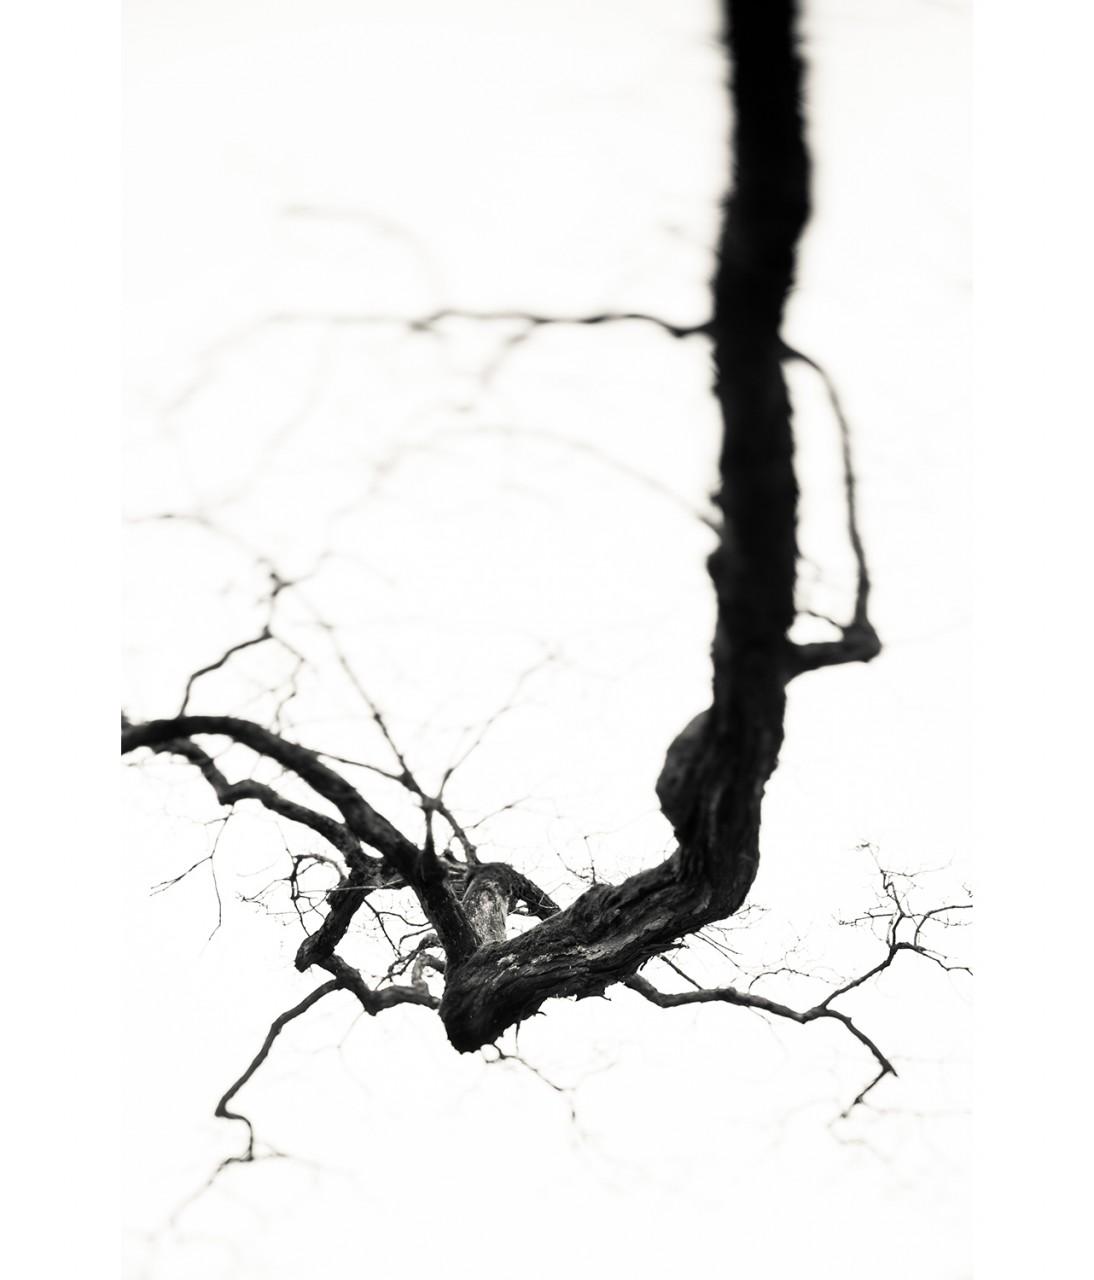 12_Centenial Tree #1